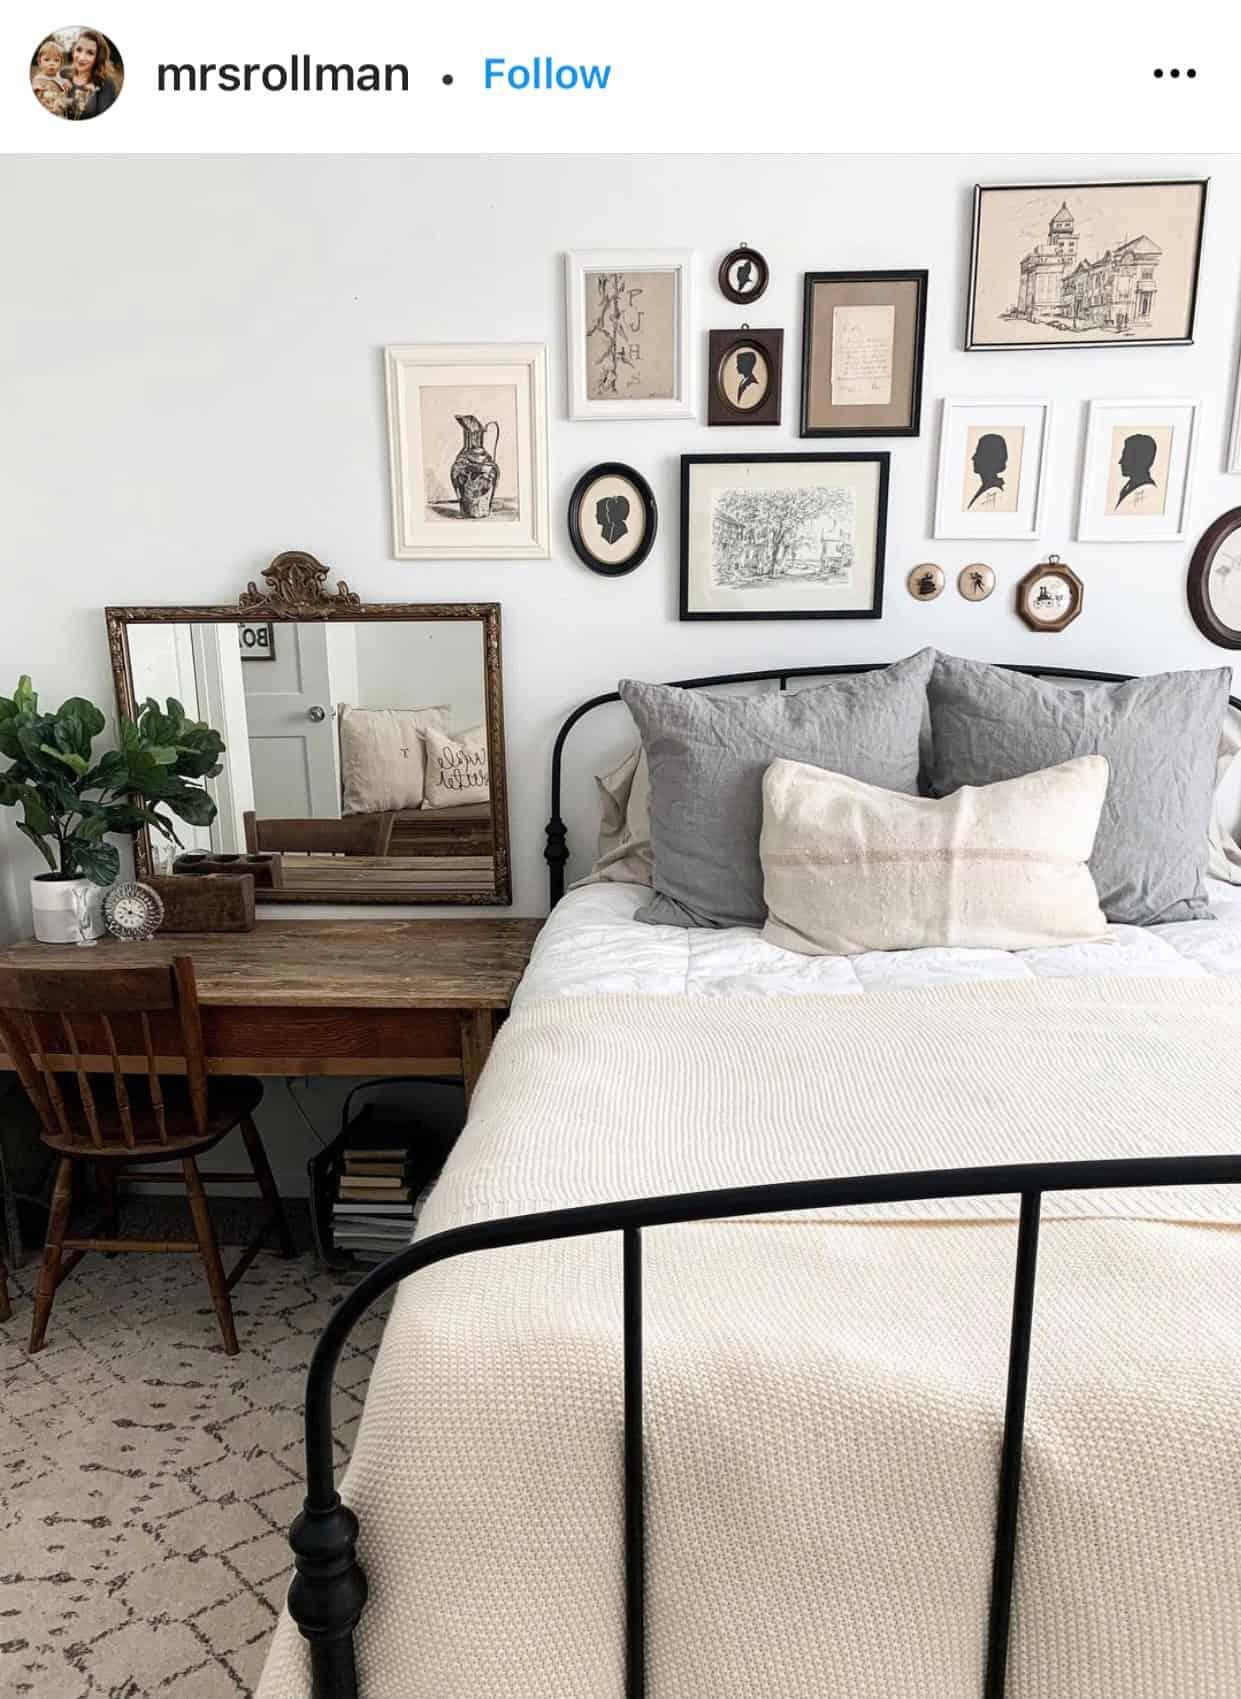 Inspiration for $100 Bedroom Makeover